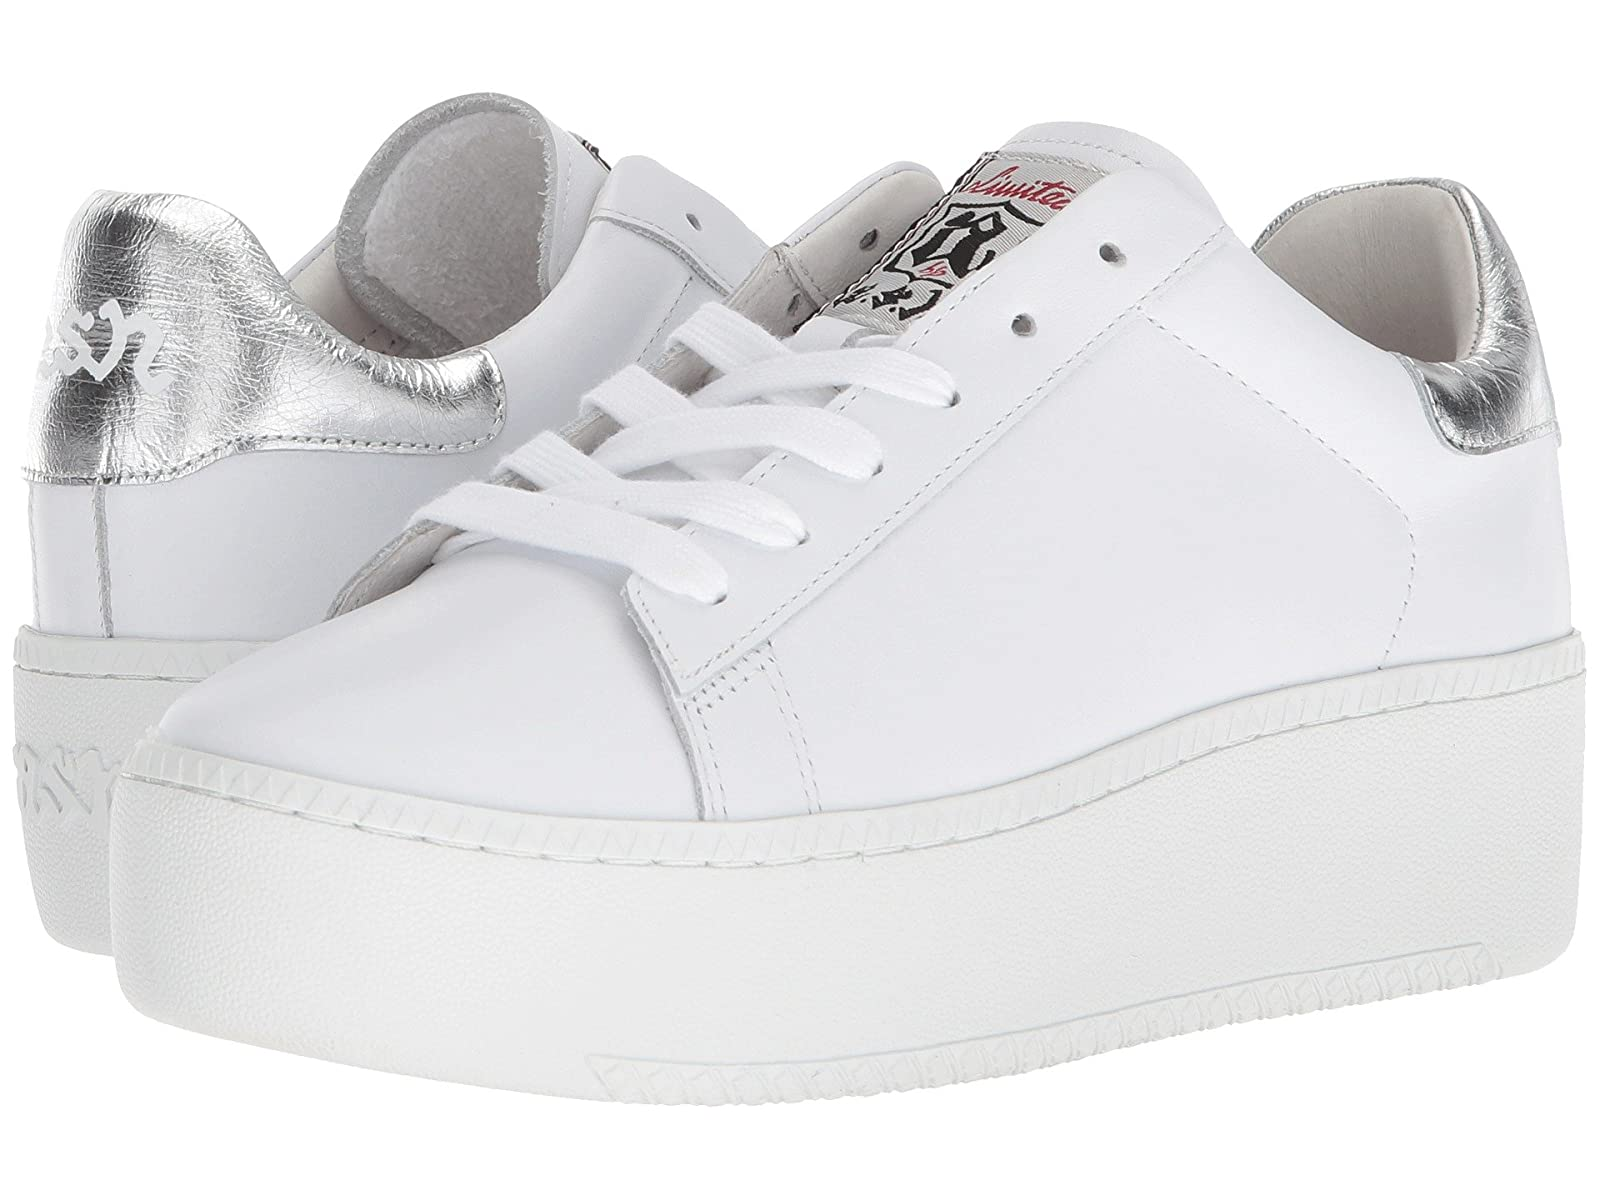 ASH CultAtmospheric grades have affordable shoes